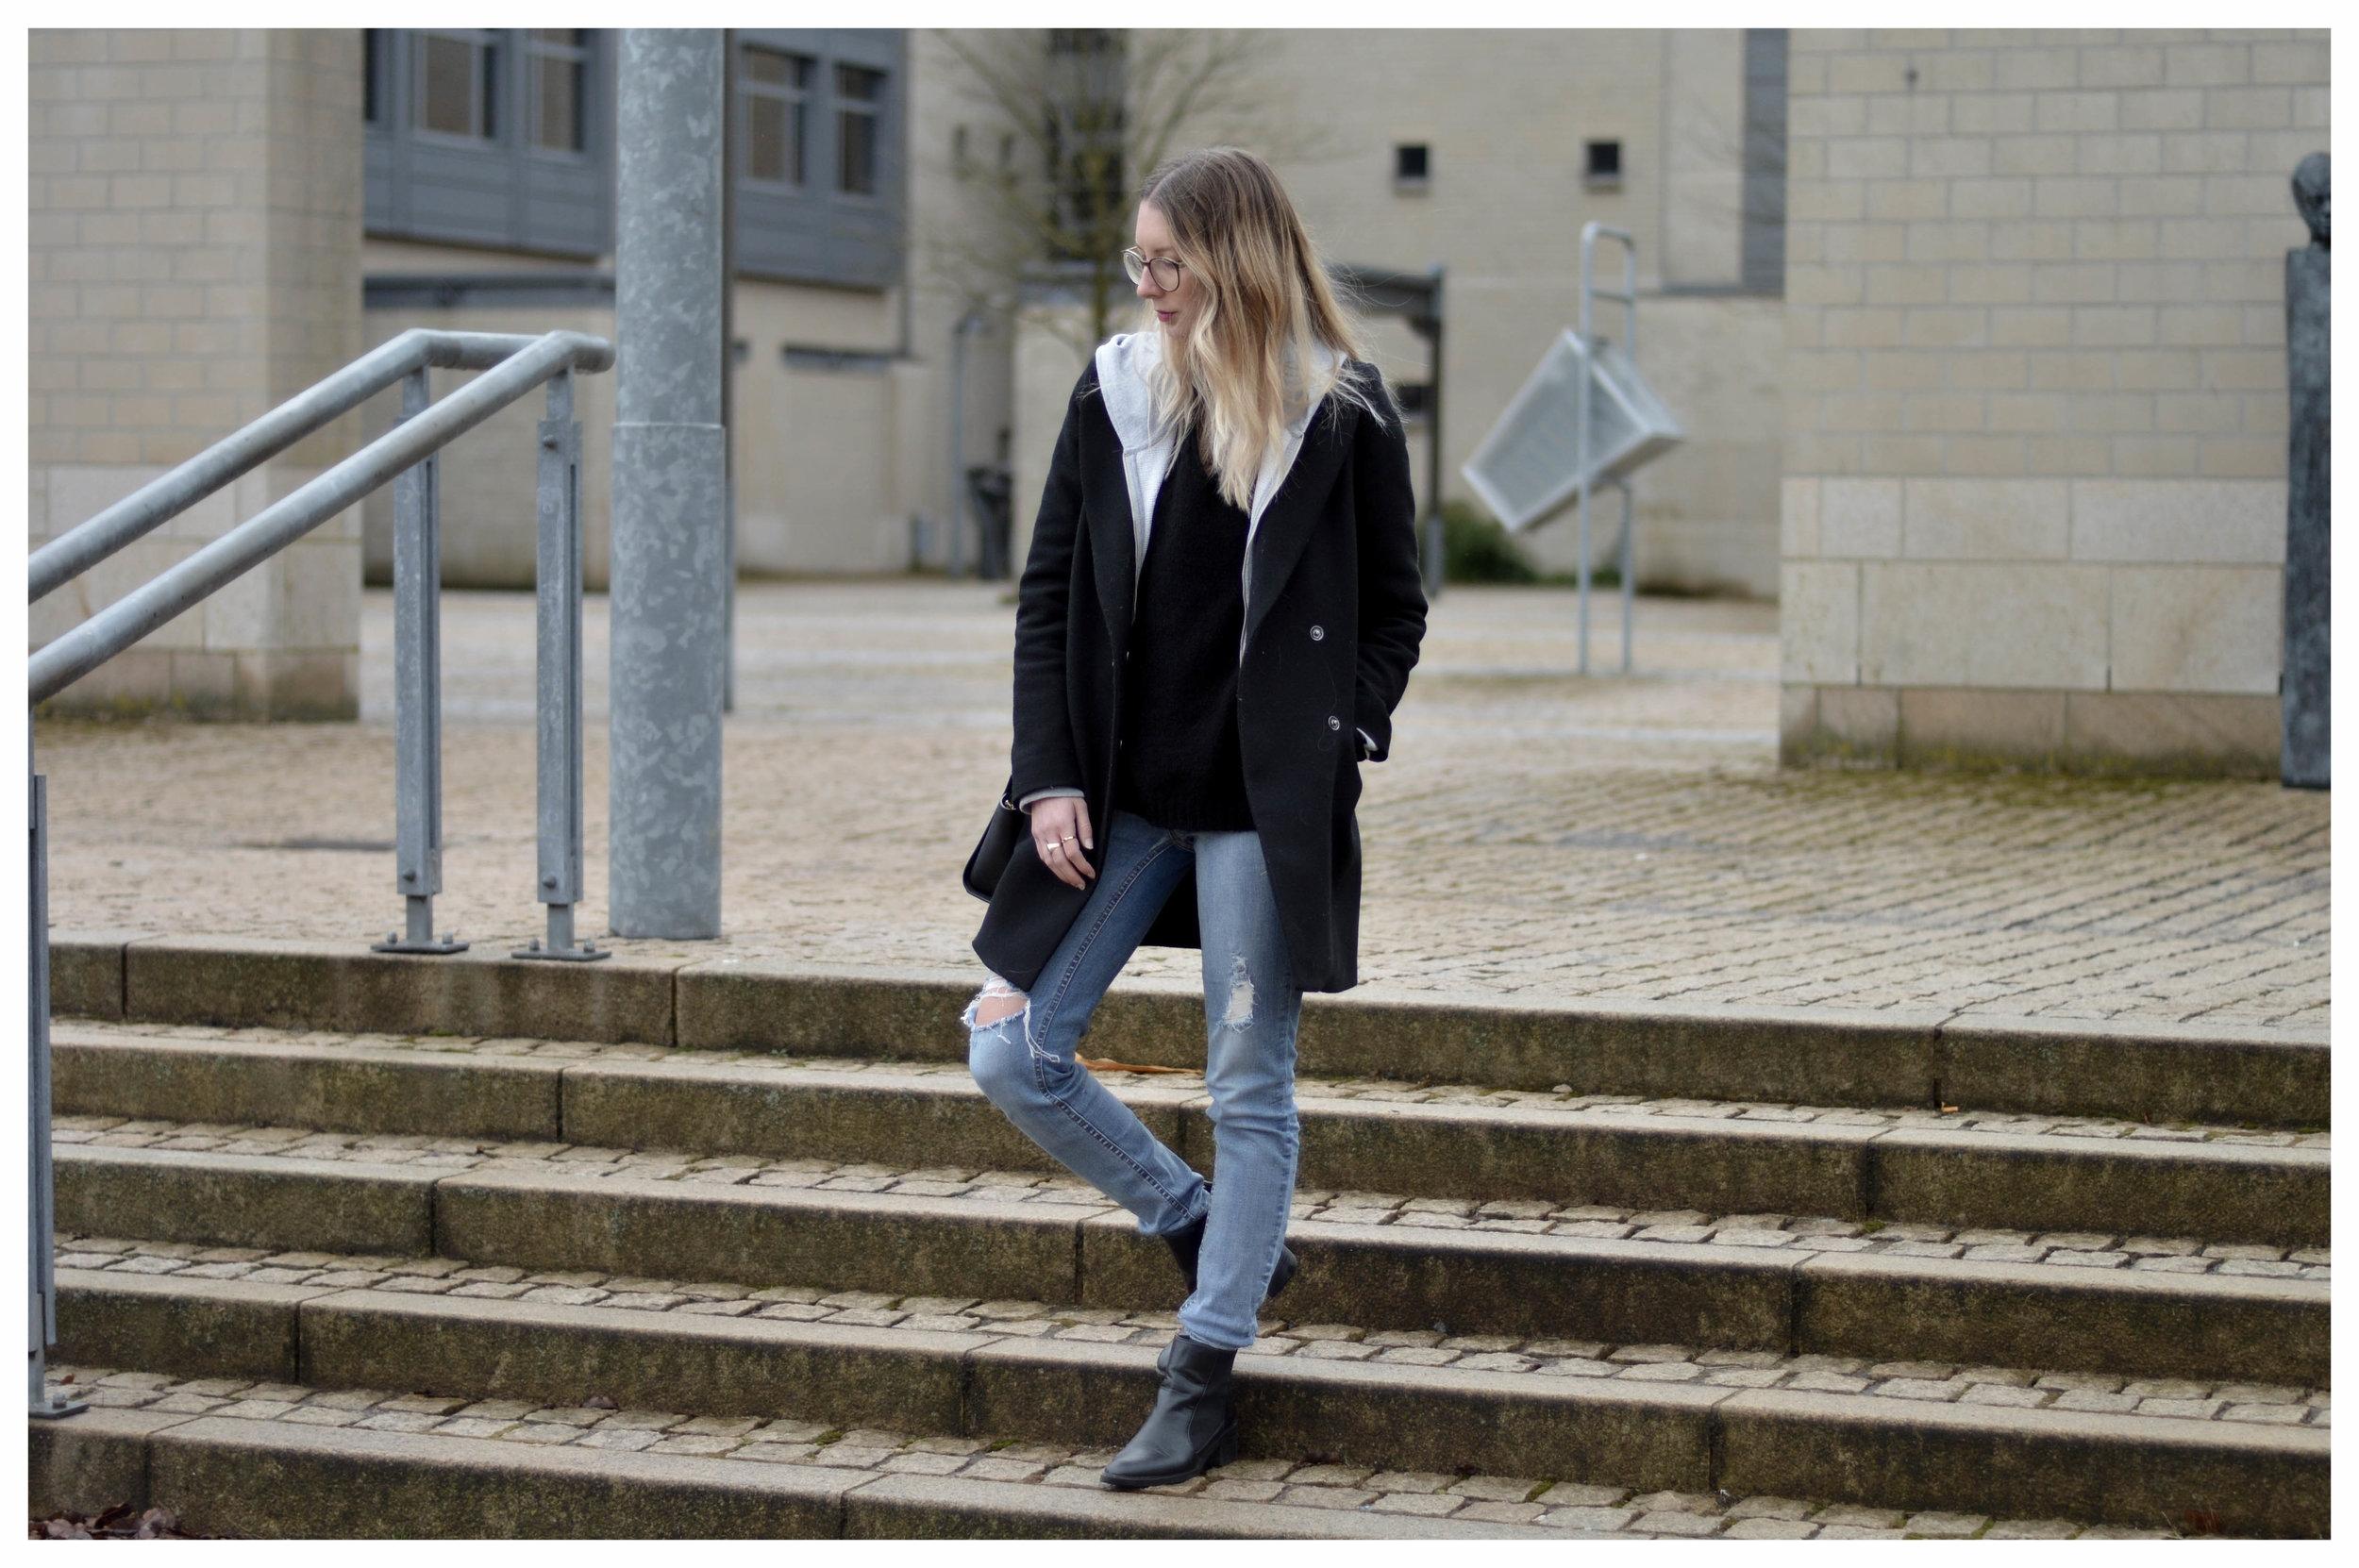 Black Coat Hoodie & Ripped Jeans - OSIARAH.COM (23 sur 54).jpg